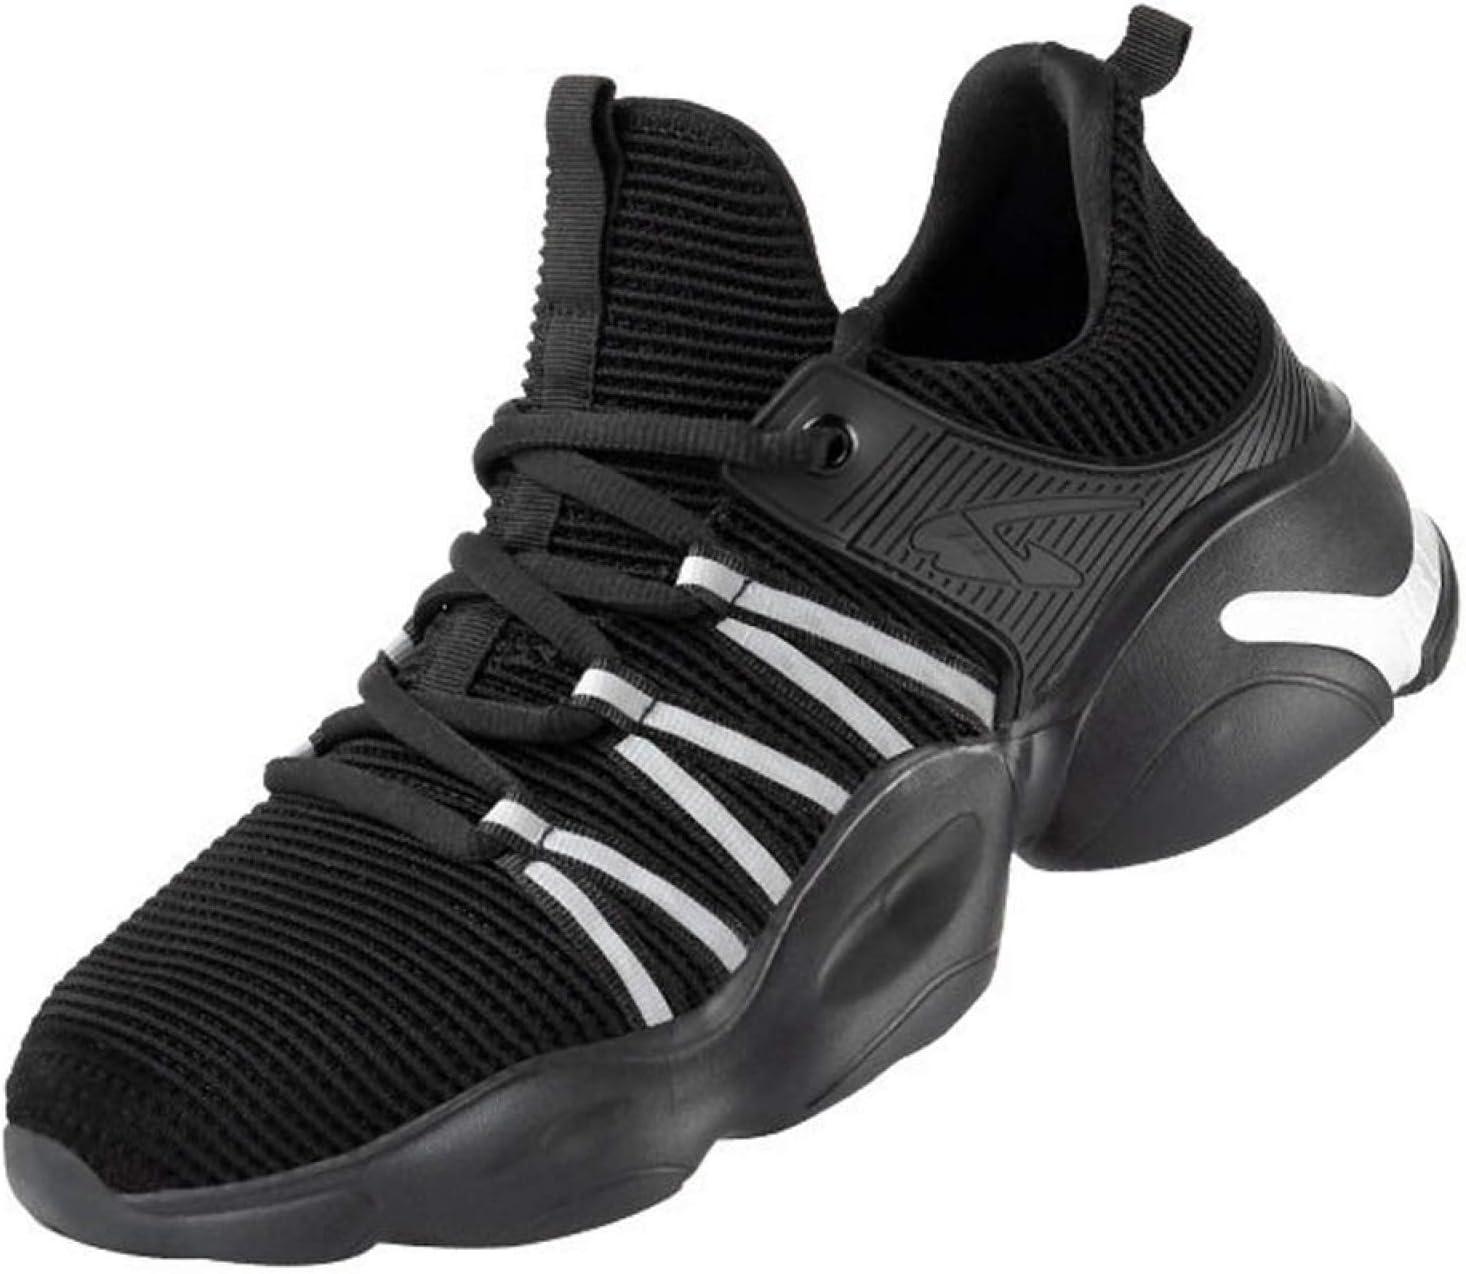 Amazon.com: AGYE Lightweight Safety Shoes Men,Women Work Trainers ...